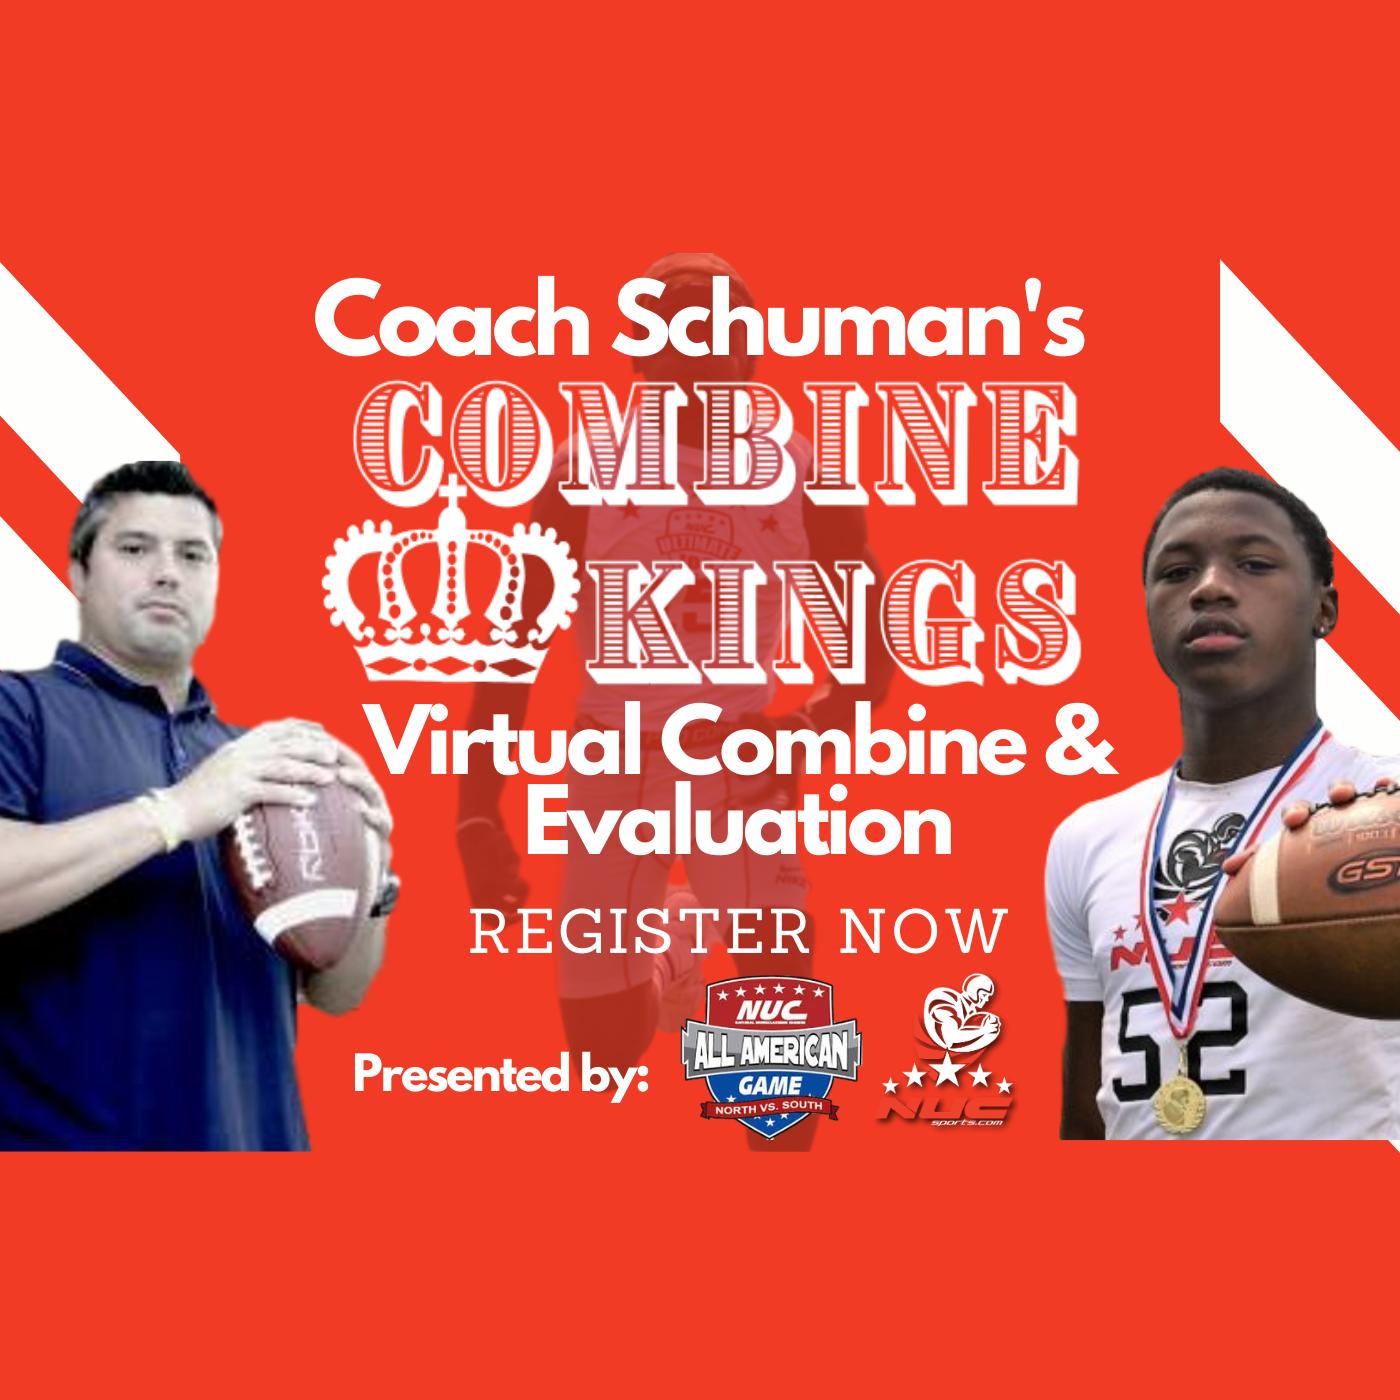 Coach Schuman's Combine Kings Virtual Combine